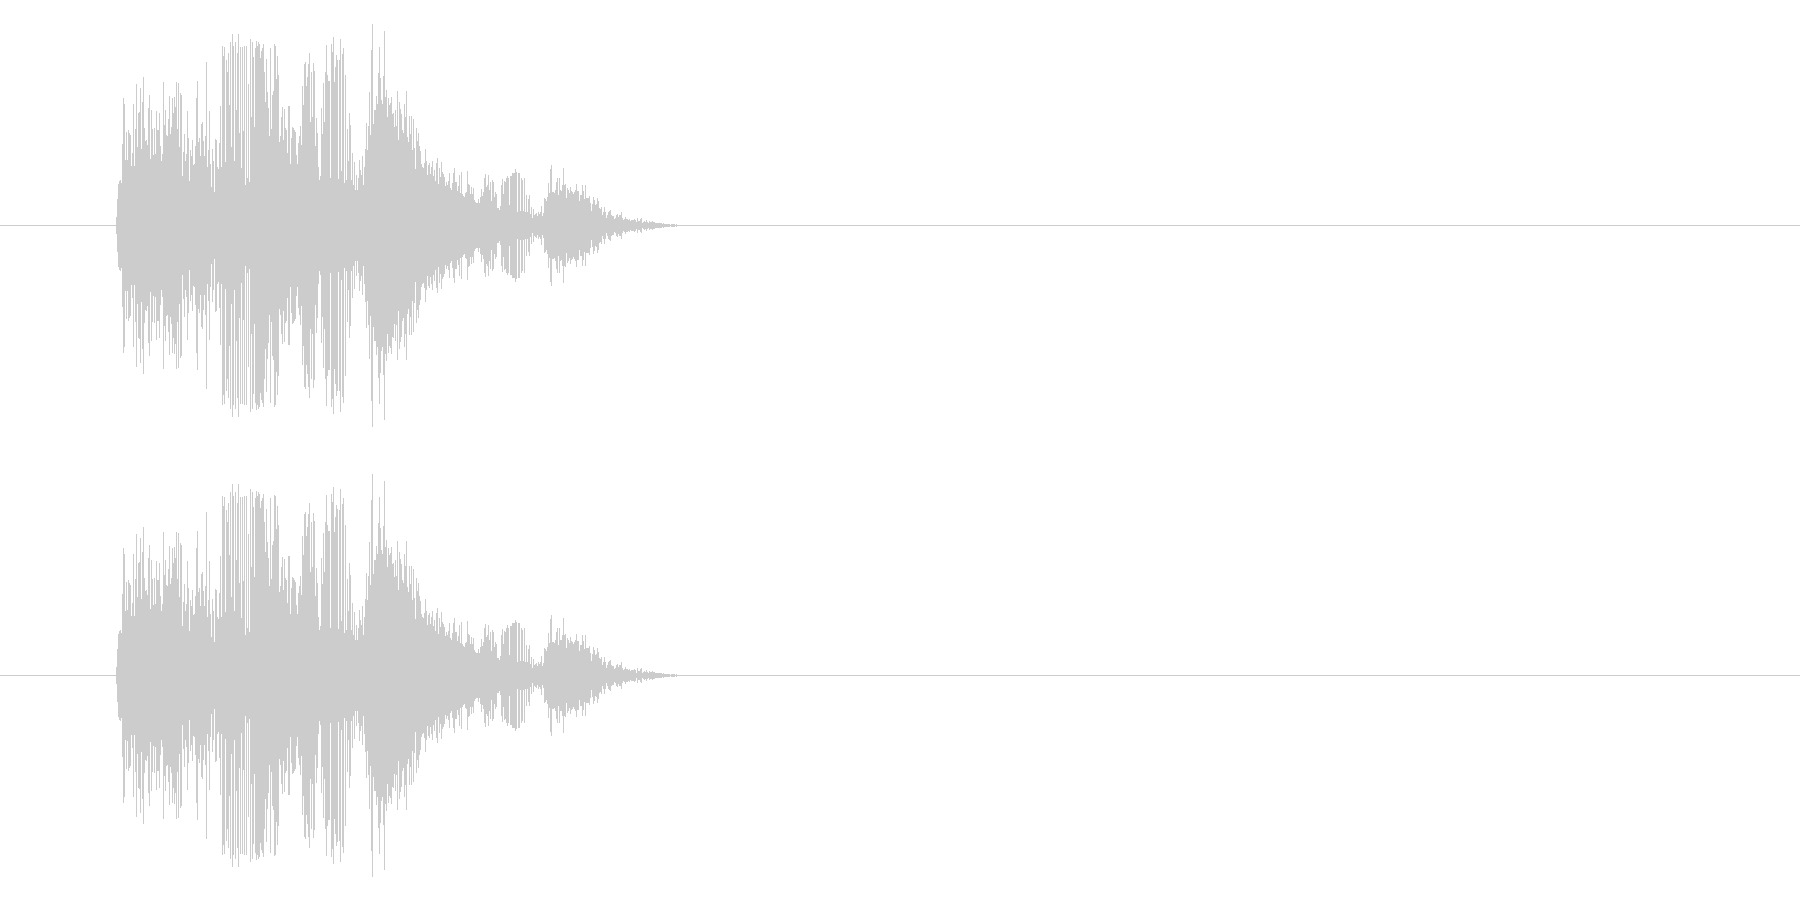 【NES RPG01-03(攻撃)】の未再生の波形